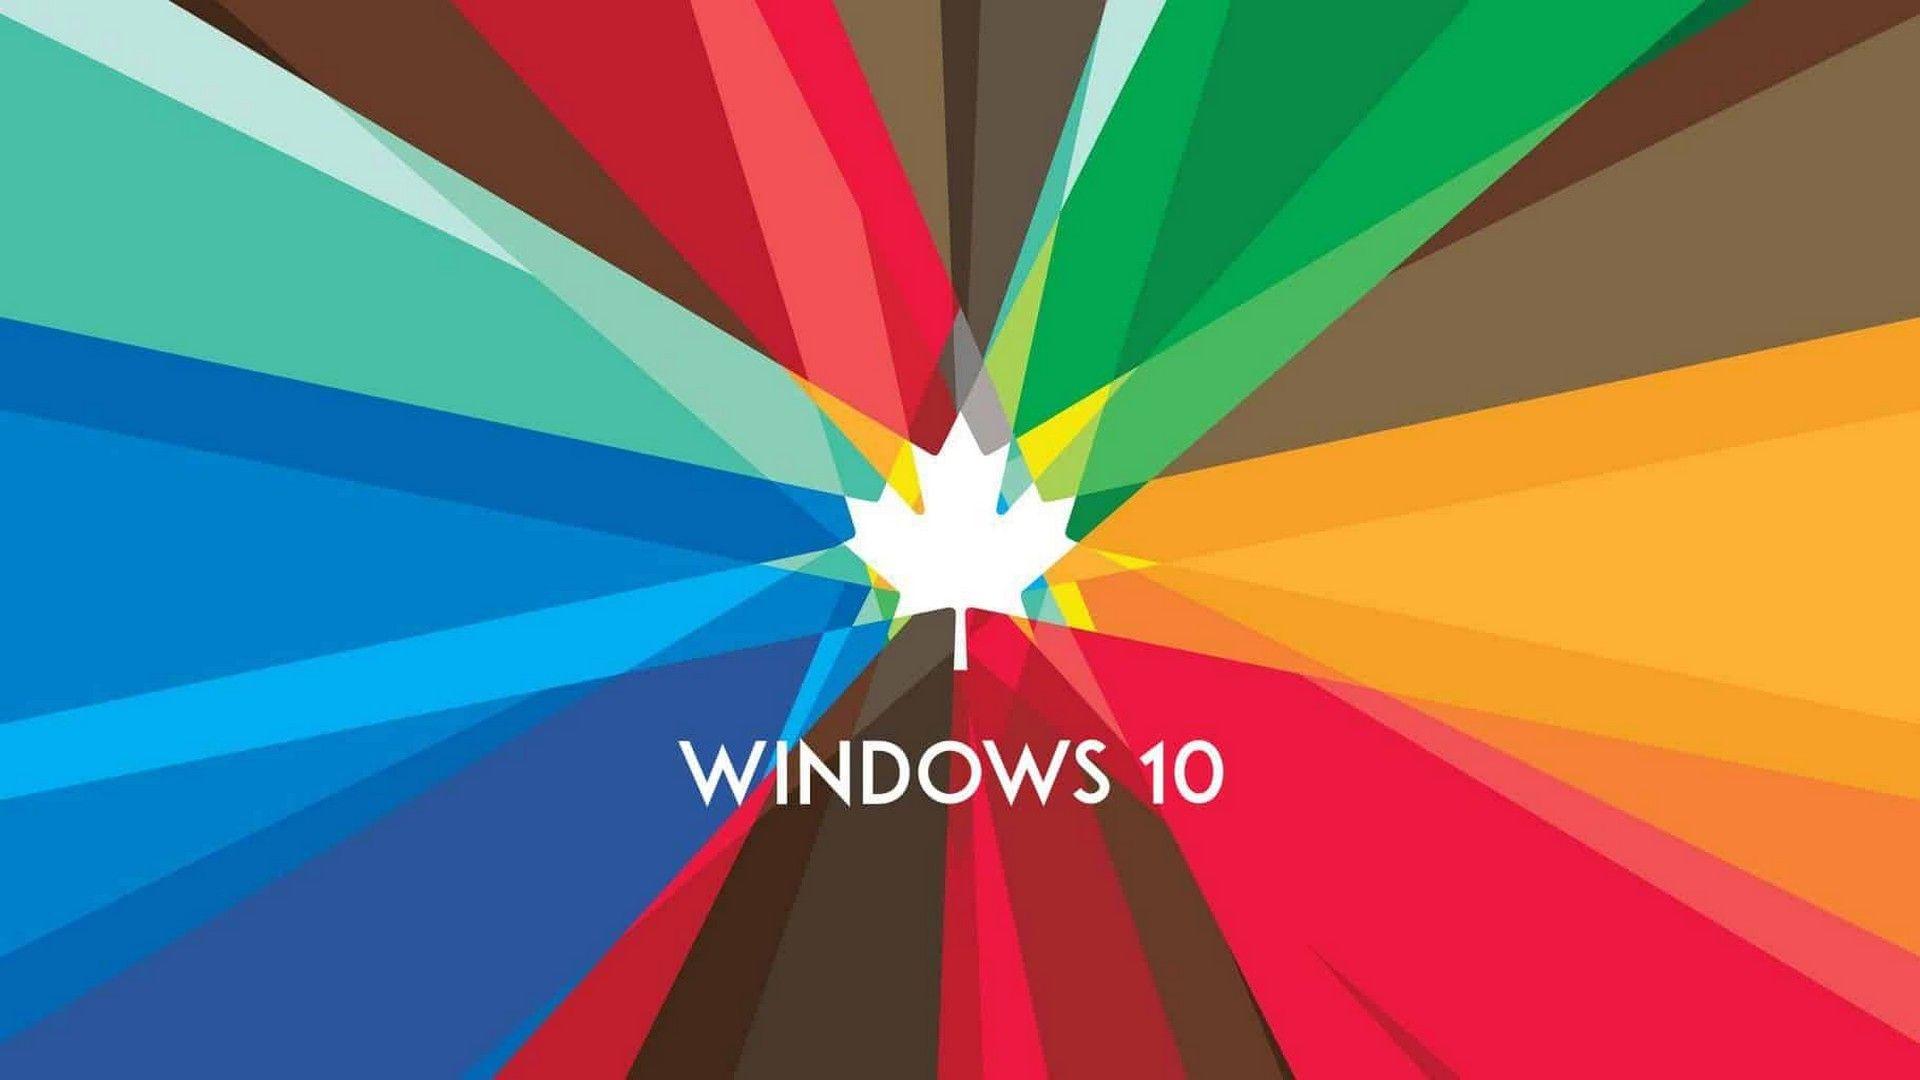 Wallpaper Windows 10 Desktop Best Wallpaper Hd Windows 10 Logo Windows 10 Wallpaper Windows 10